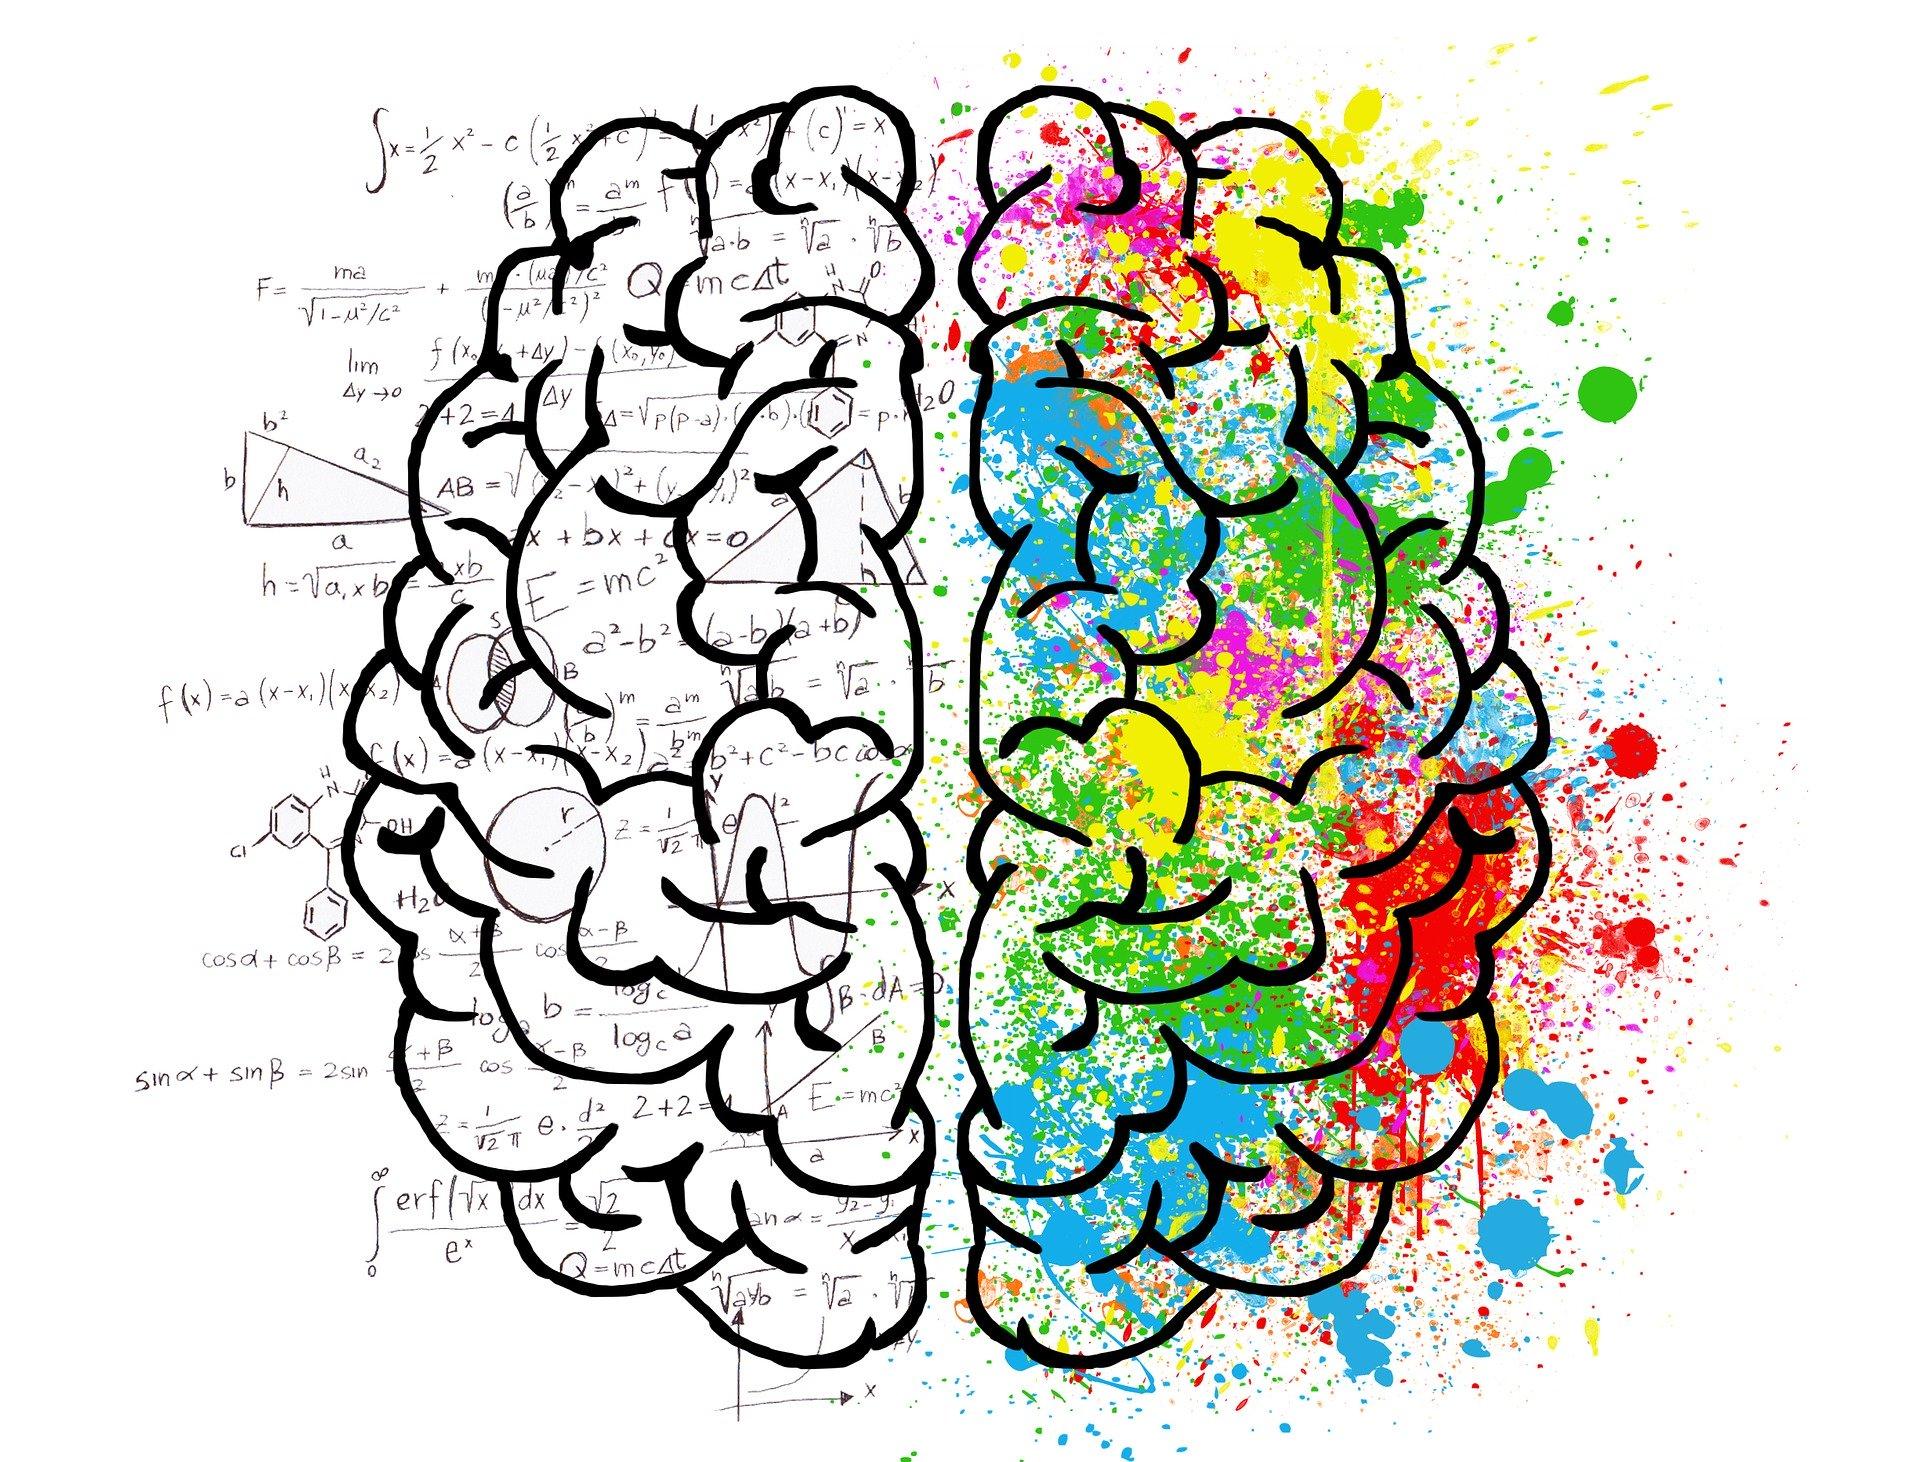 Burnout vermeiden- durch Aktivierung der rechten Gehirnhälfte